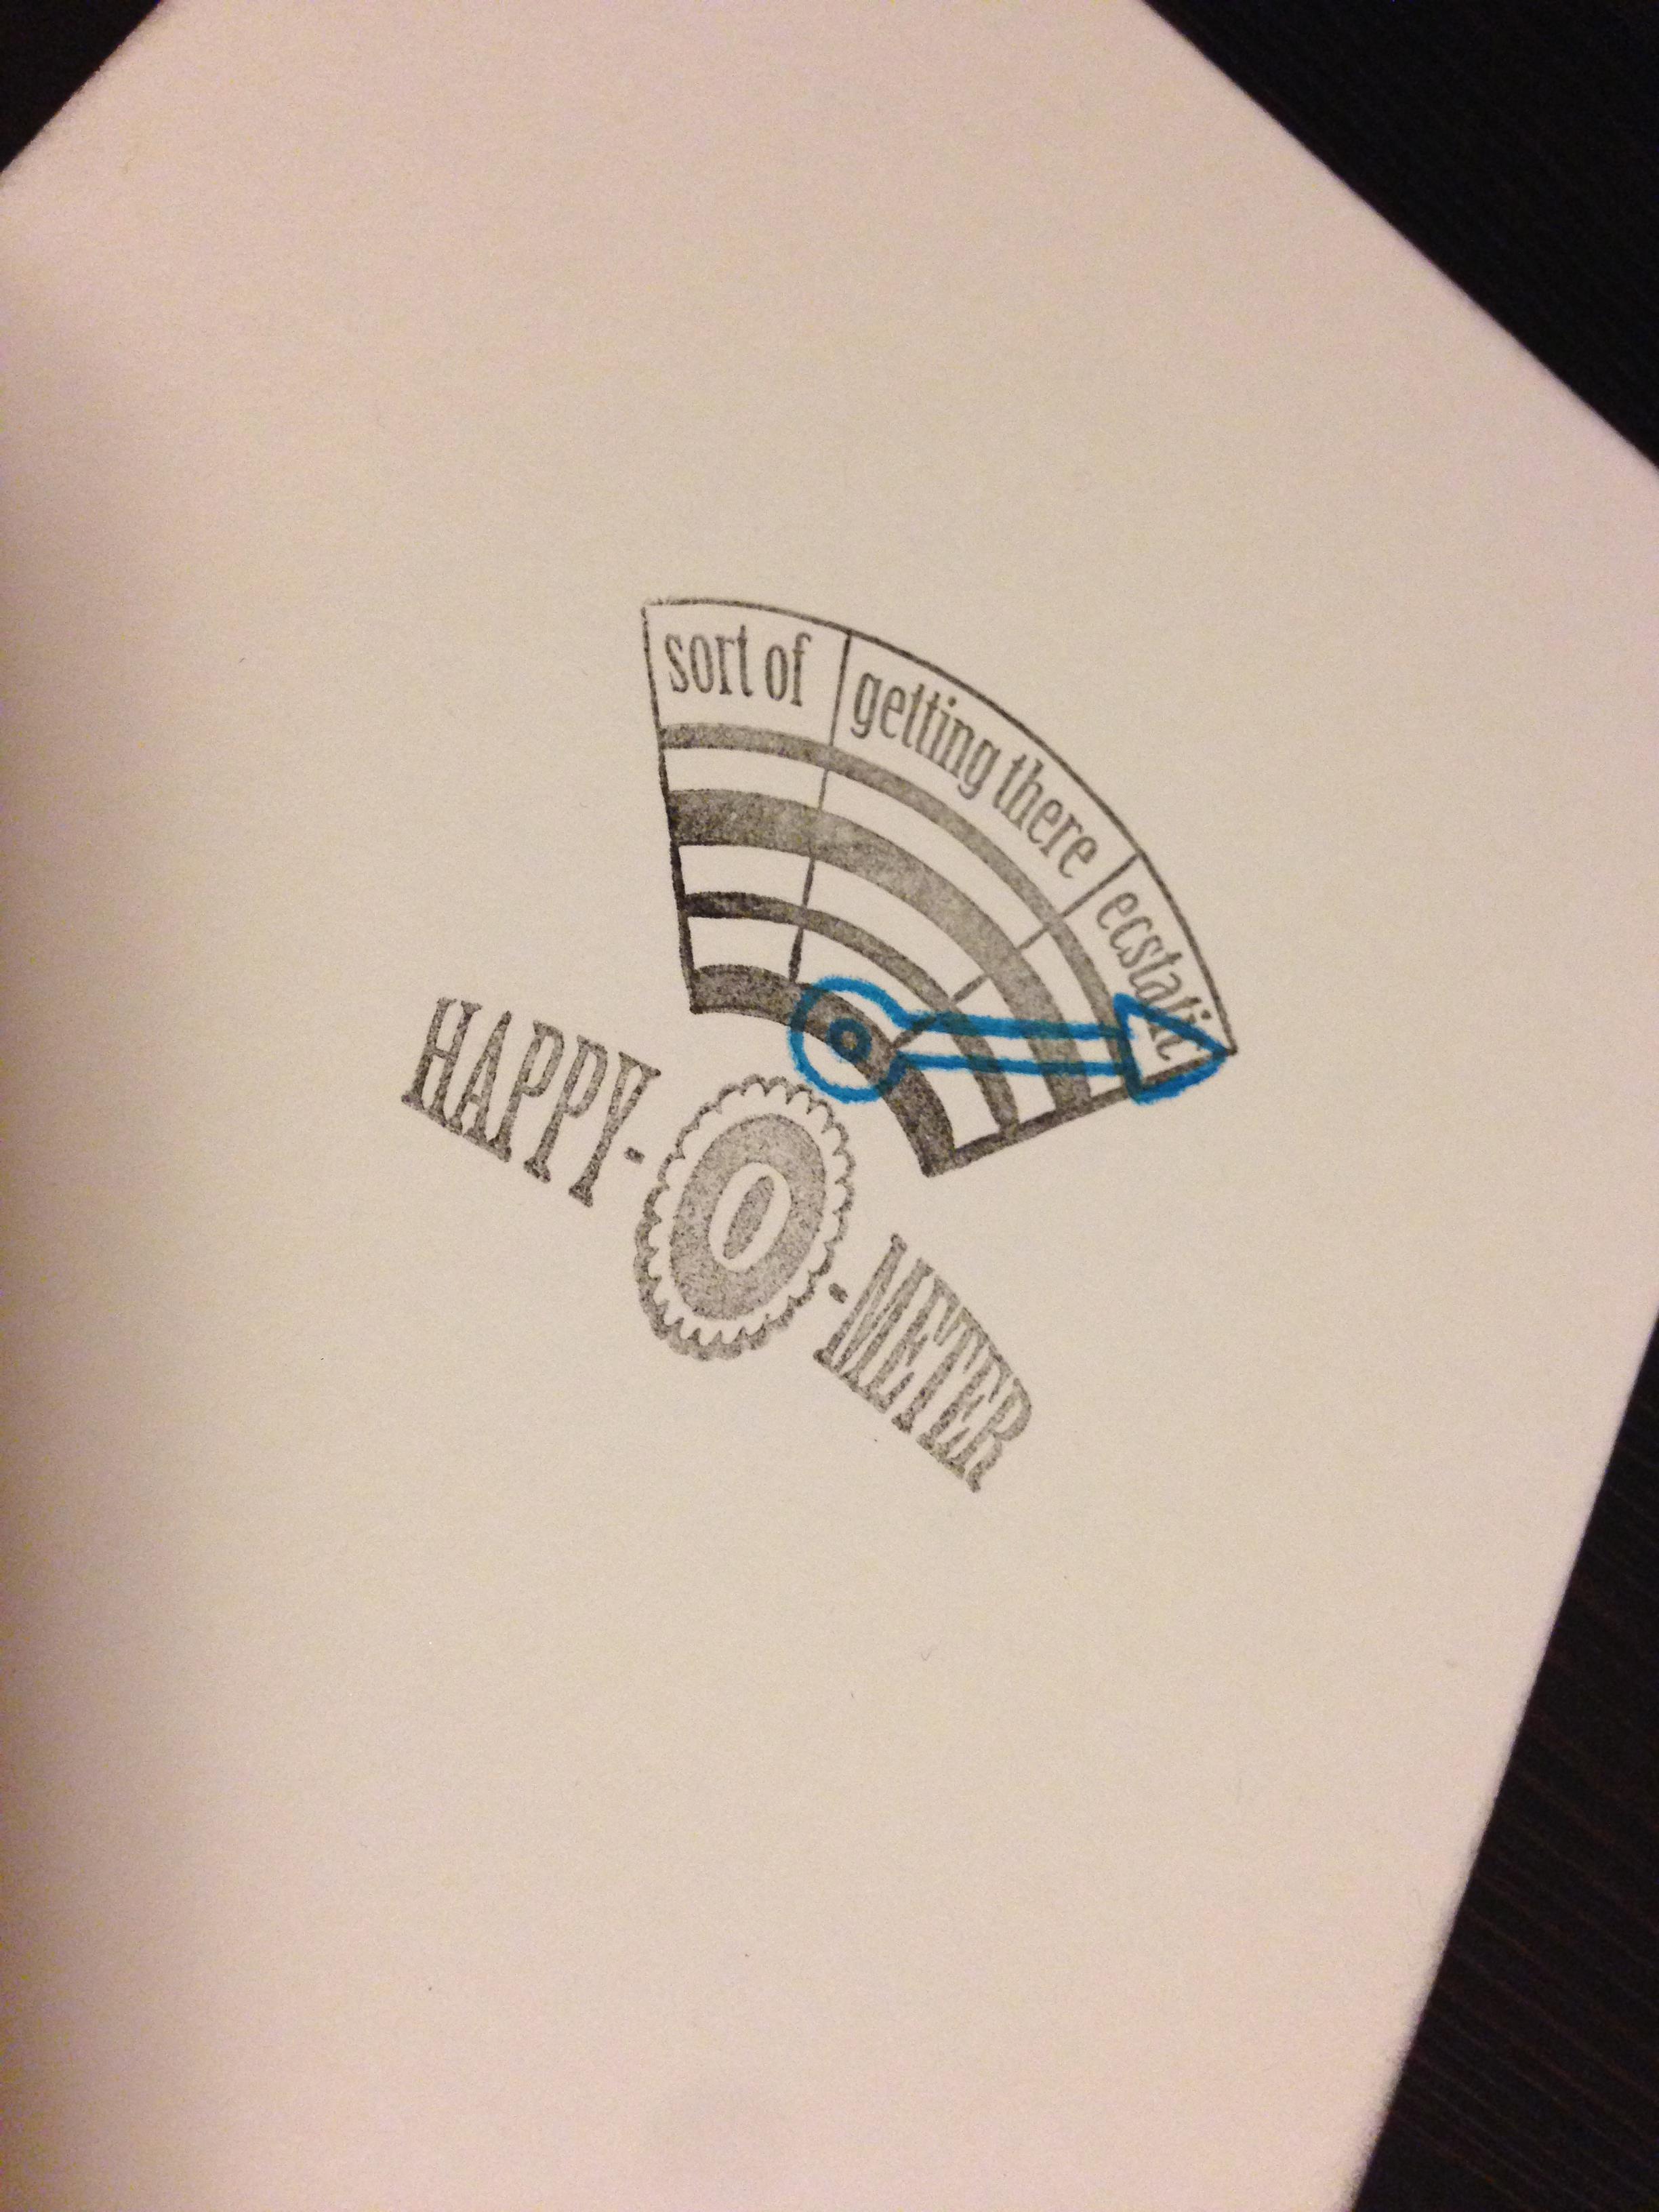 Happy-O-Meter